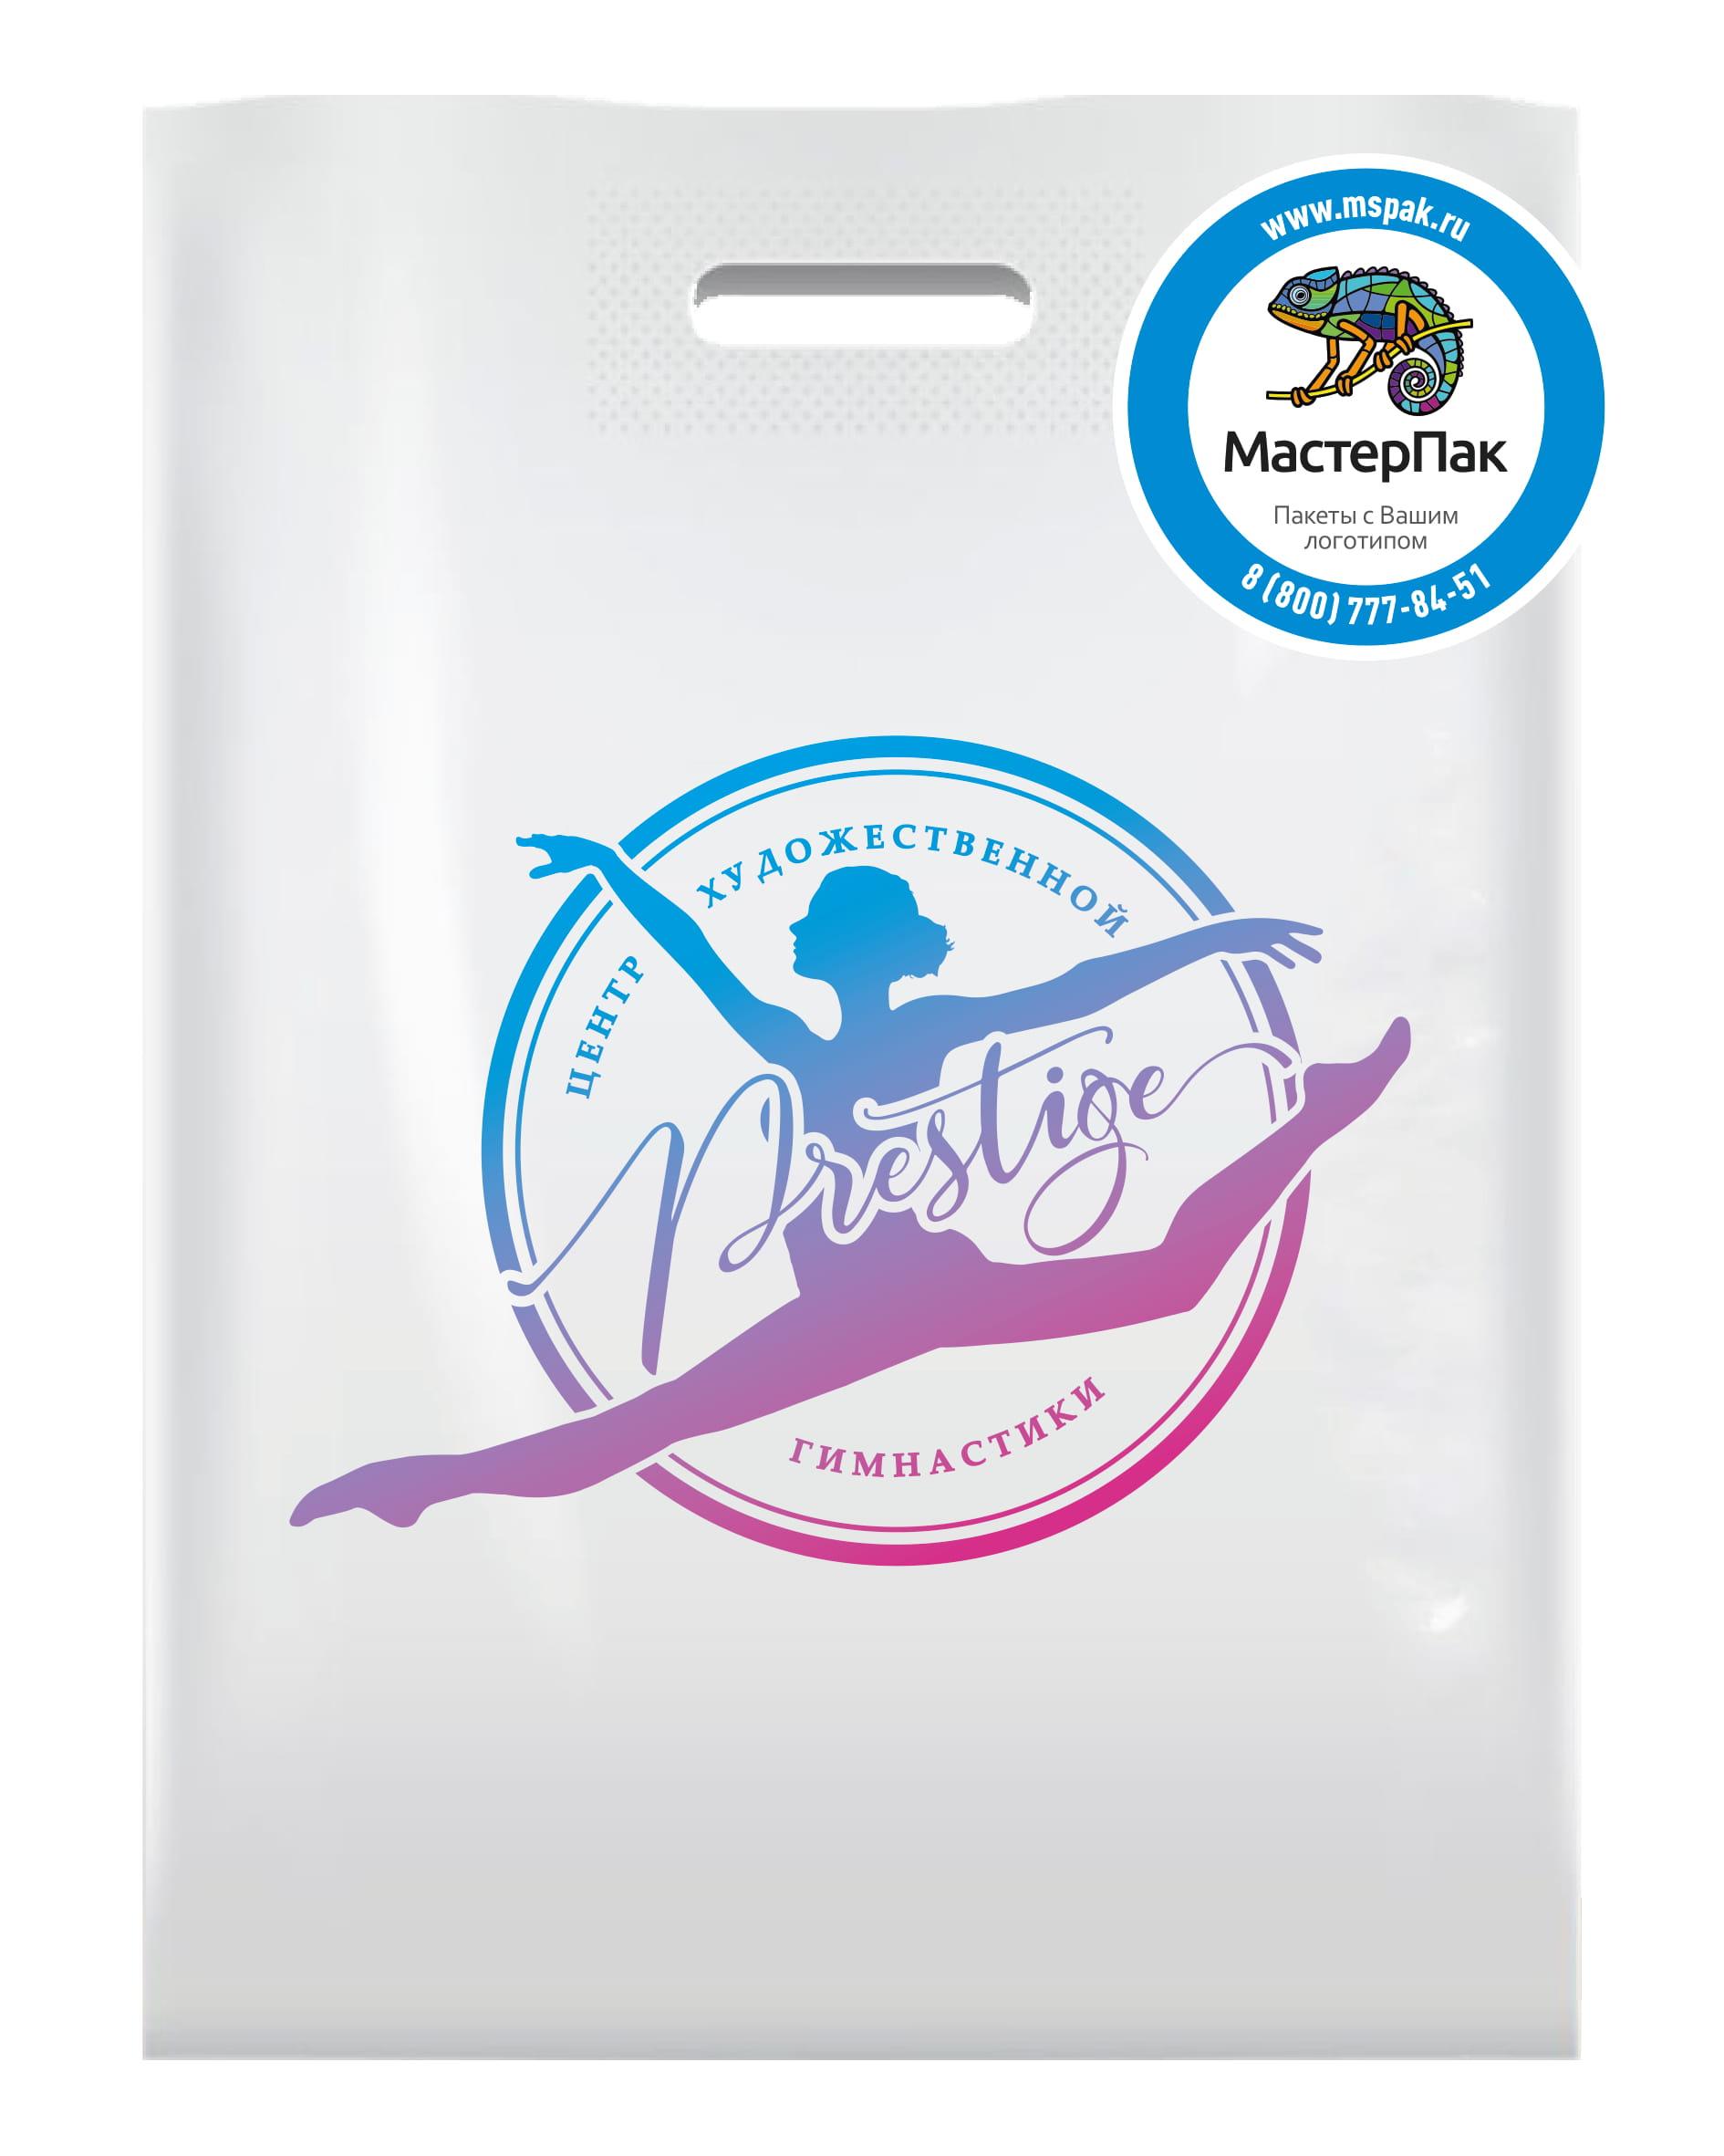 Пакет ПВД с логотипом Prestige, Спб, 70 мкм, 30*40